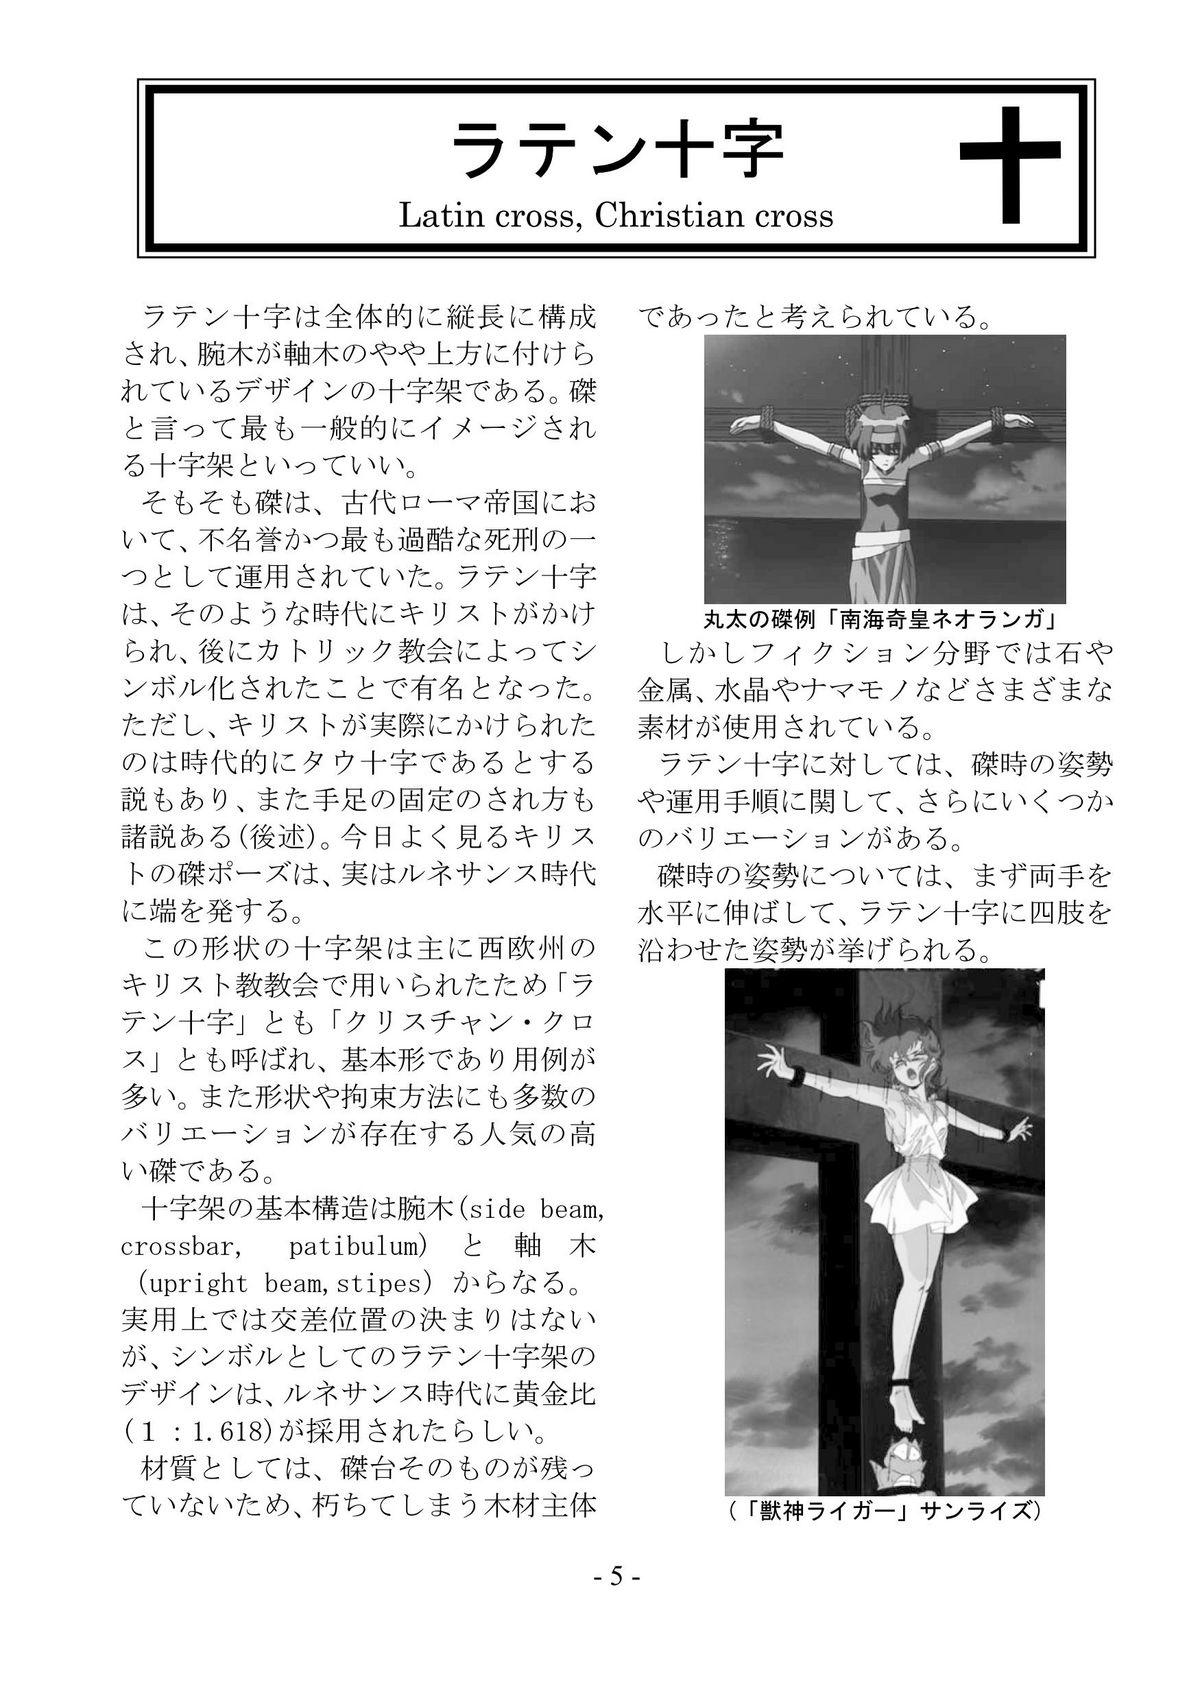 encyclopedia of crucifixion 5